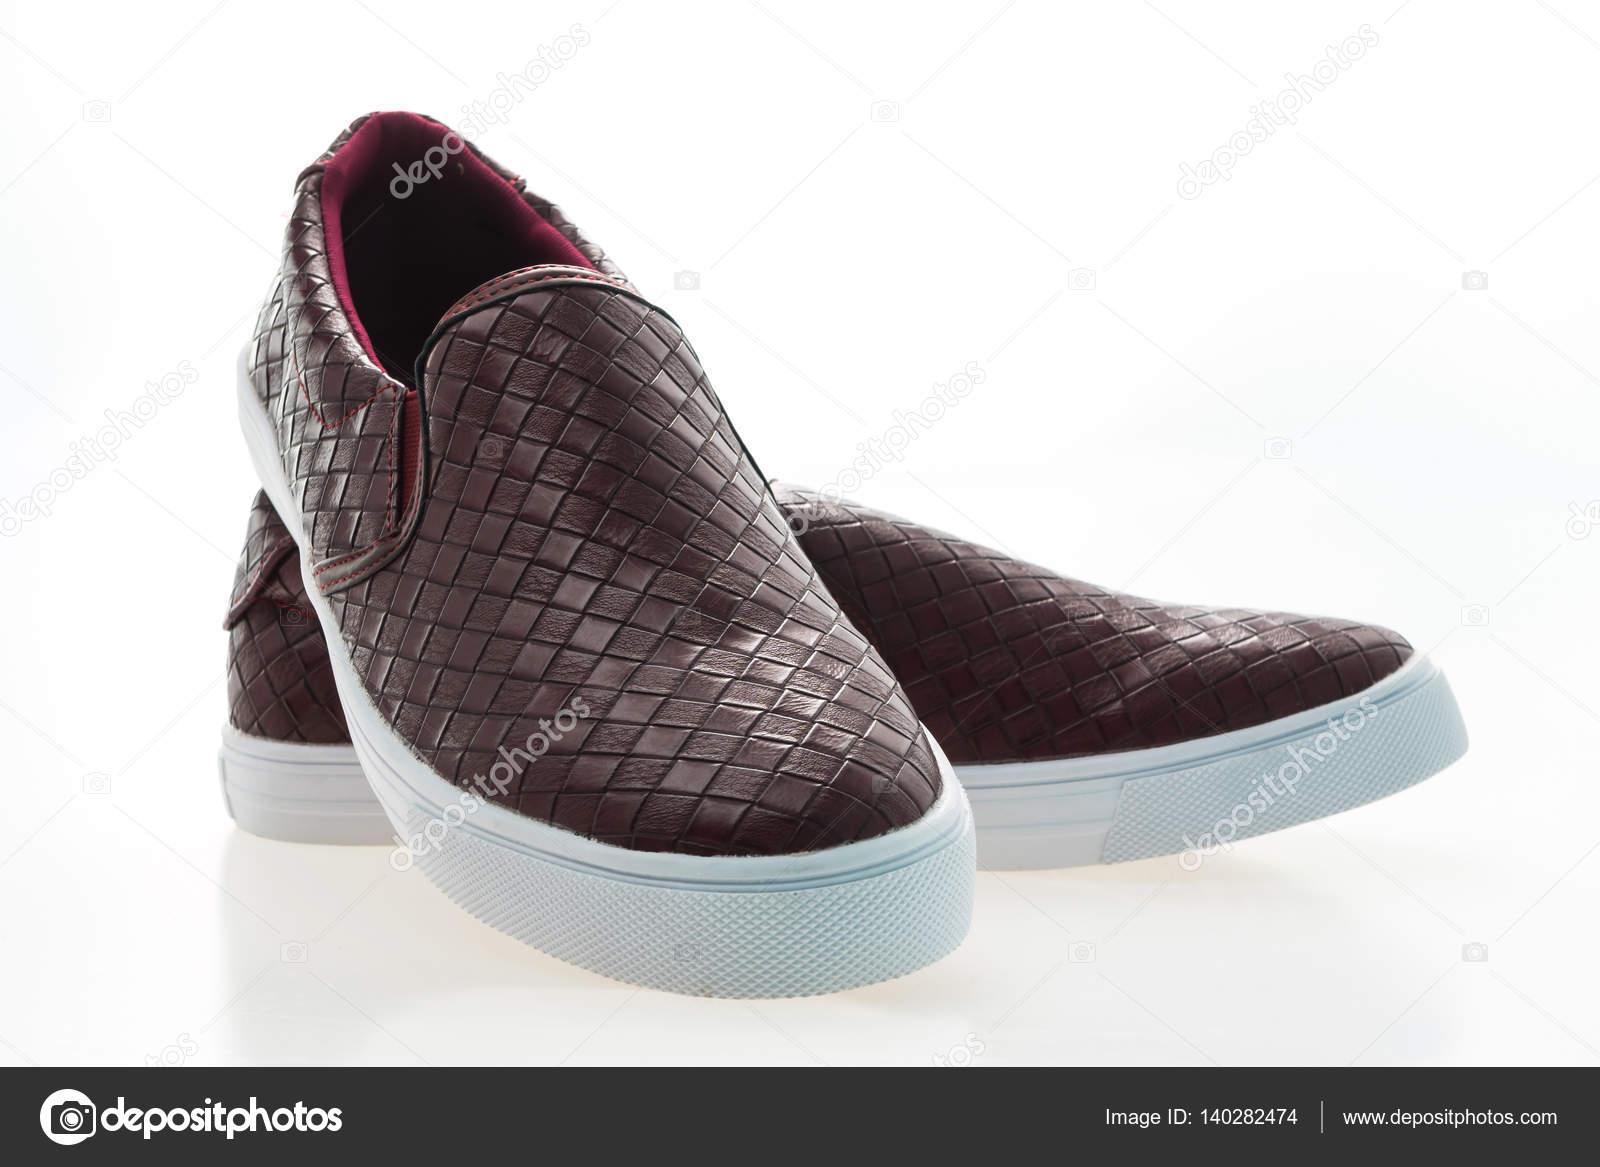 7af98818e43 νέα παπούτσια πάνινα παπούτσια μόδας — Φωτογραφία Αρχείου ...